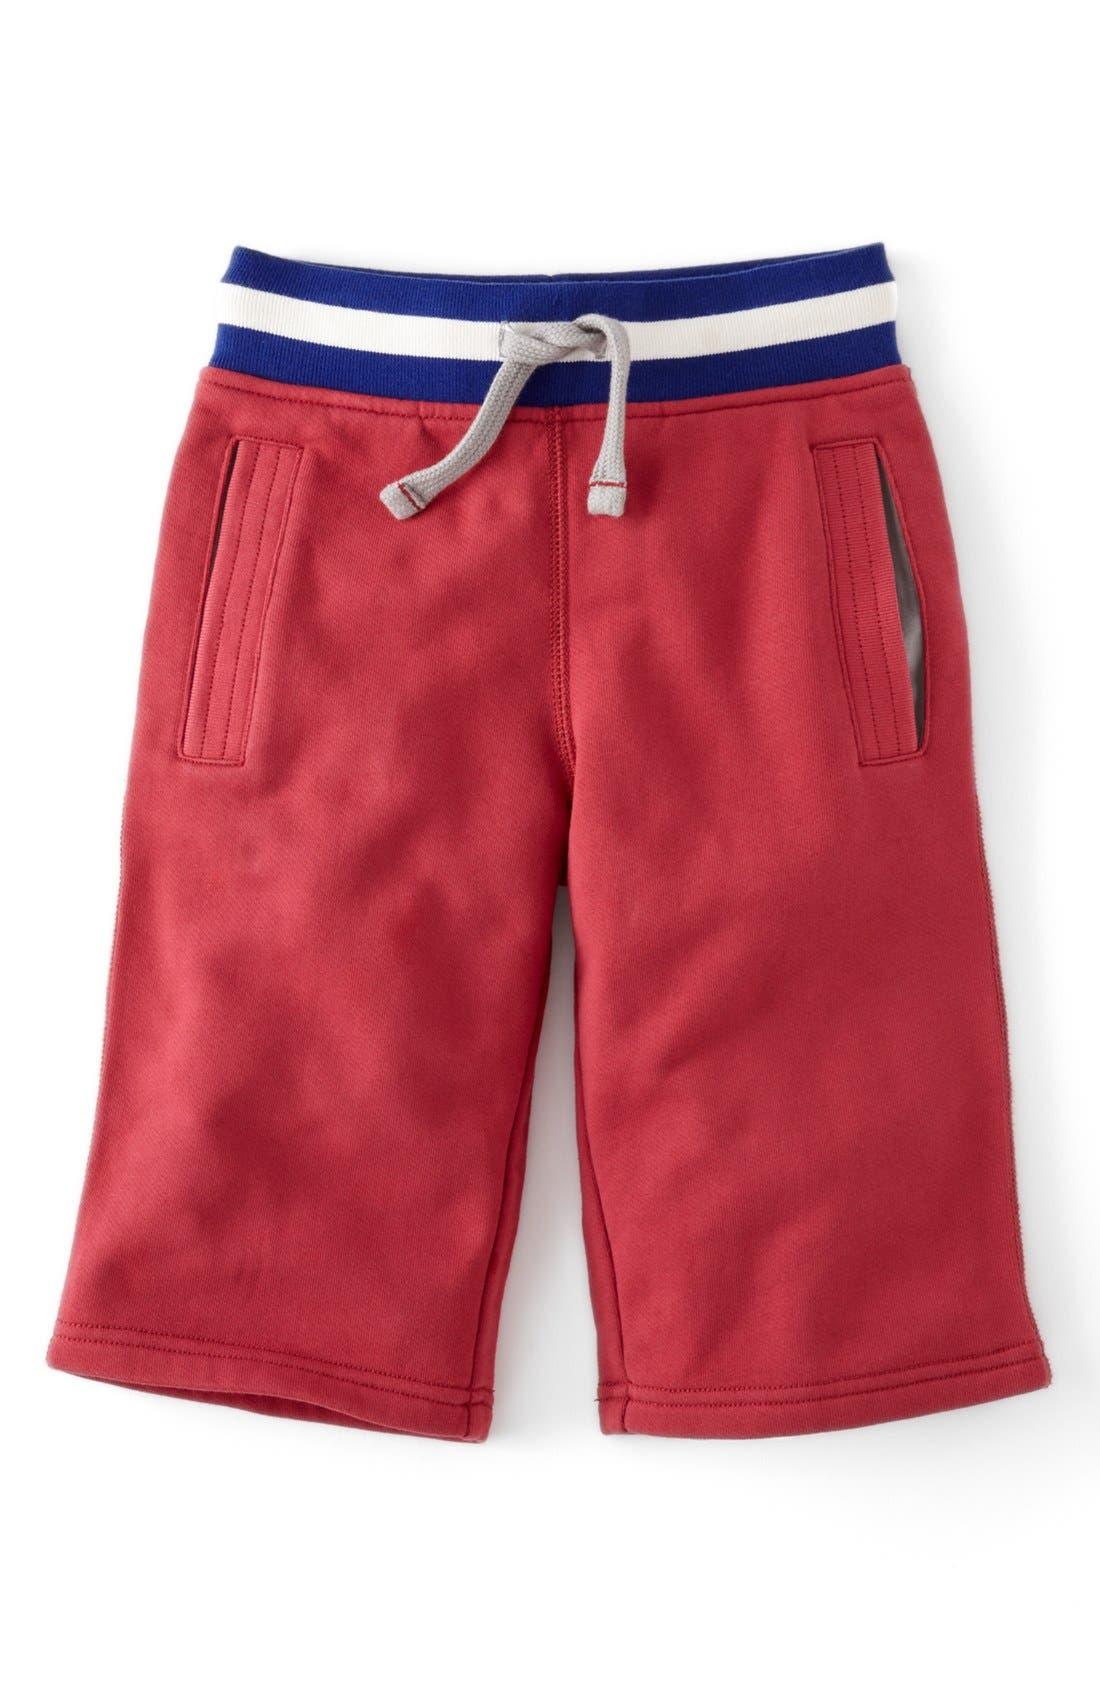 Alternate Image 1 Selected - Mini Boden Knit Shorts (Toddler Boys, Little Boys & Big Boys)